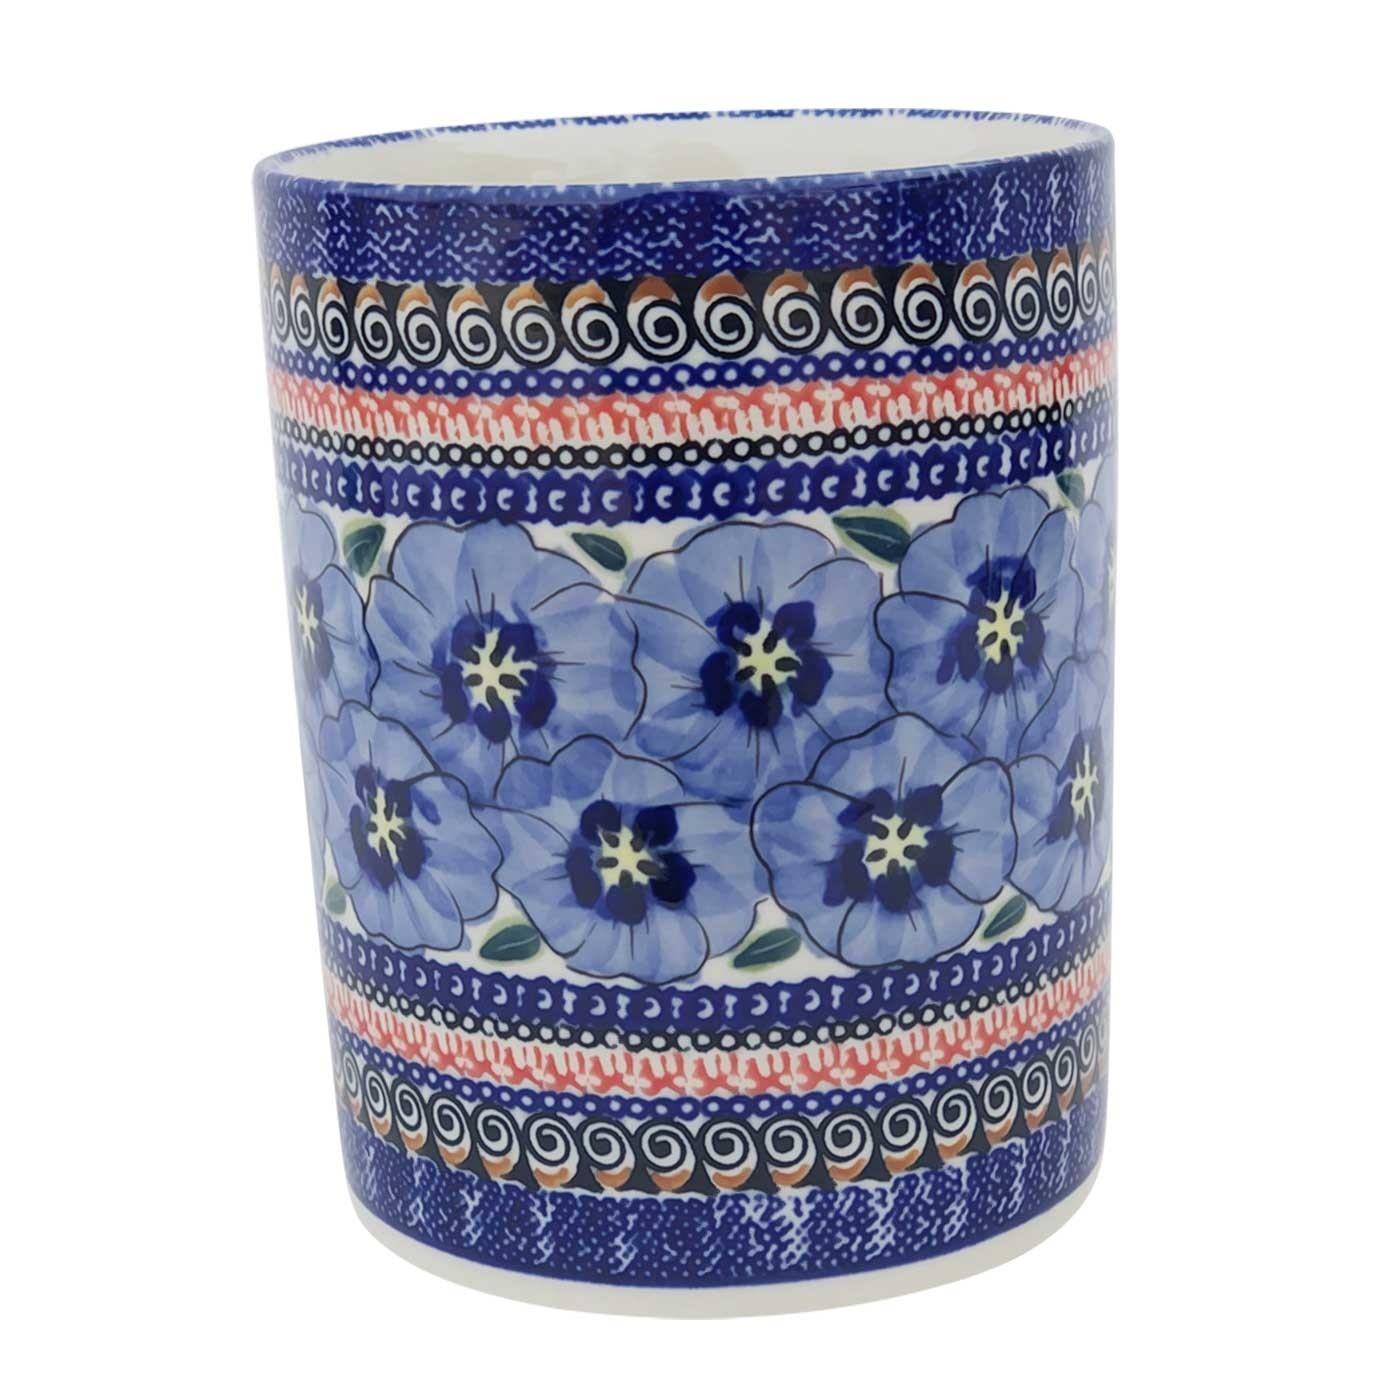 "Pottery Avenue 7"" Stoneware Untensil Jar - 932-148AR Blue Pansy"